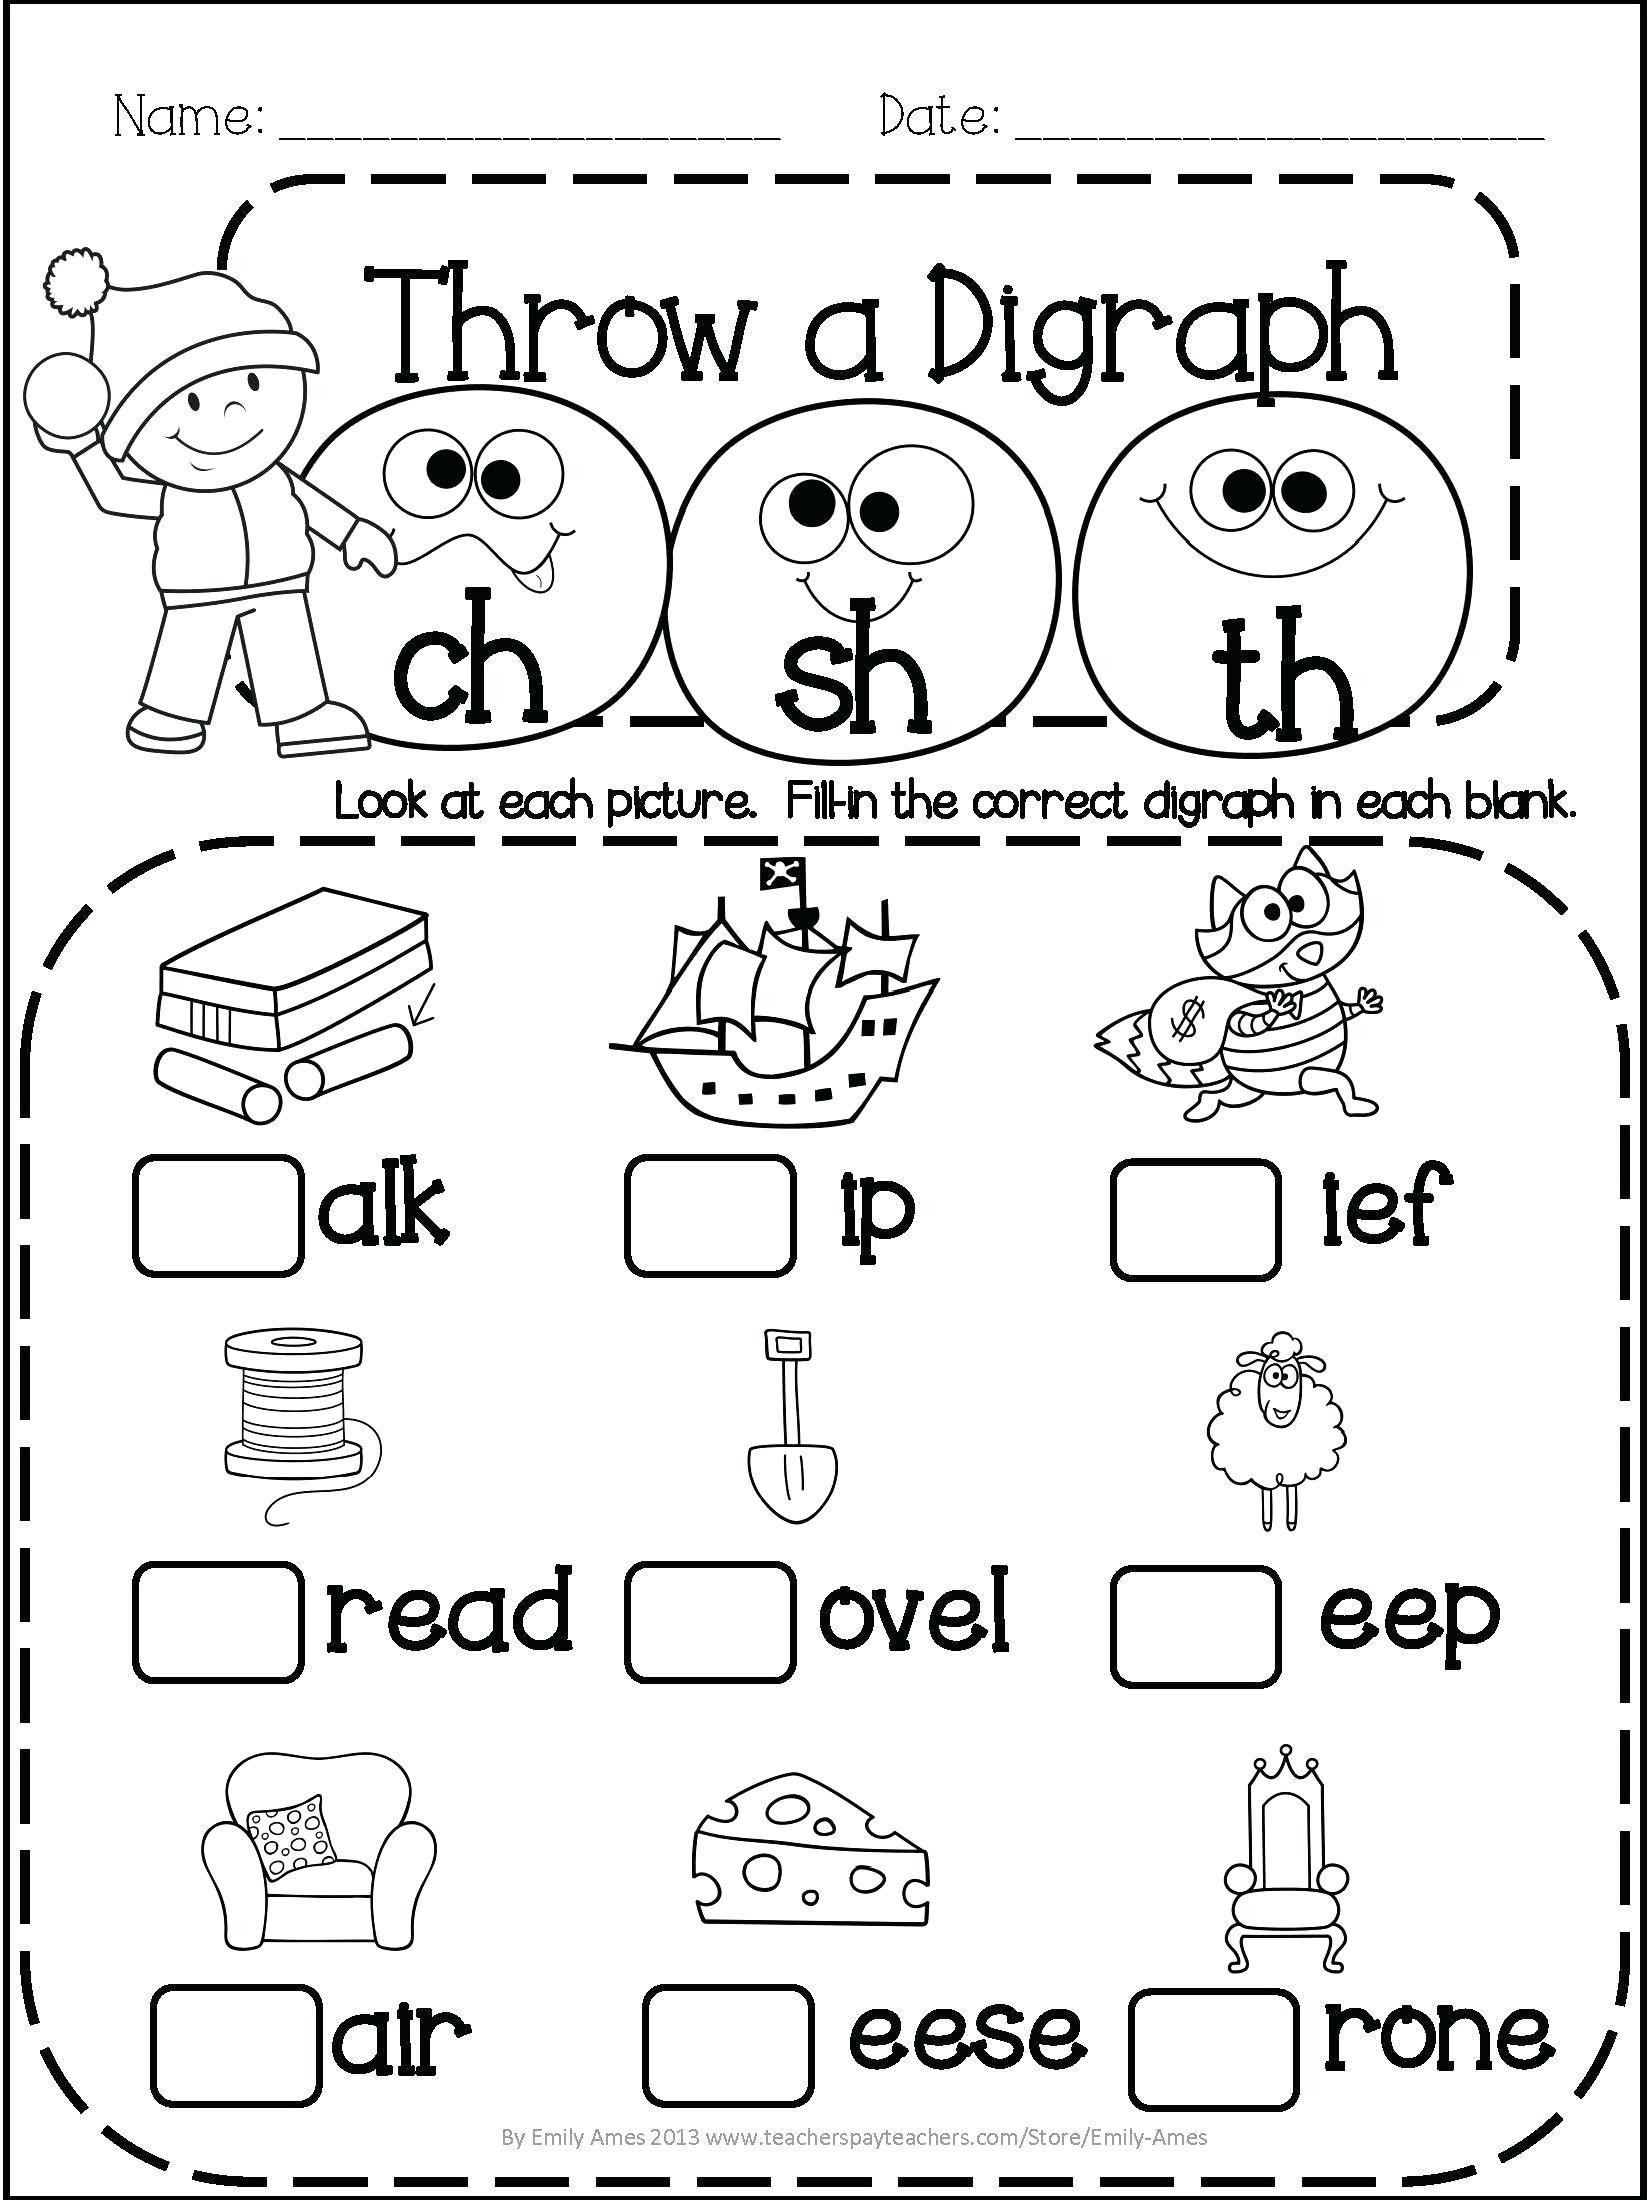 Saxon Math 2 Worksheets Kindergarten Phonics Worksheets Blends Worksheets Phonics Worksheets